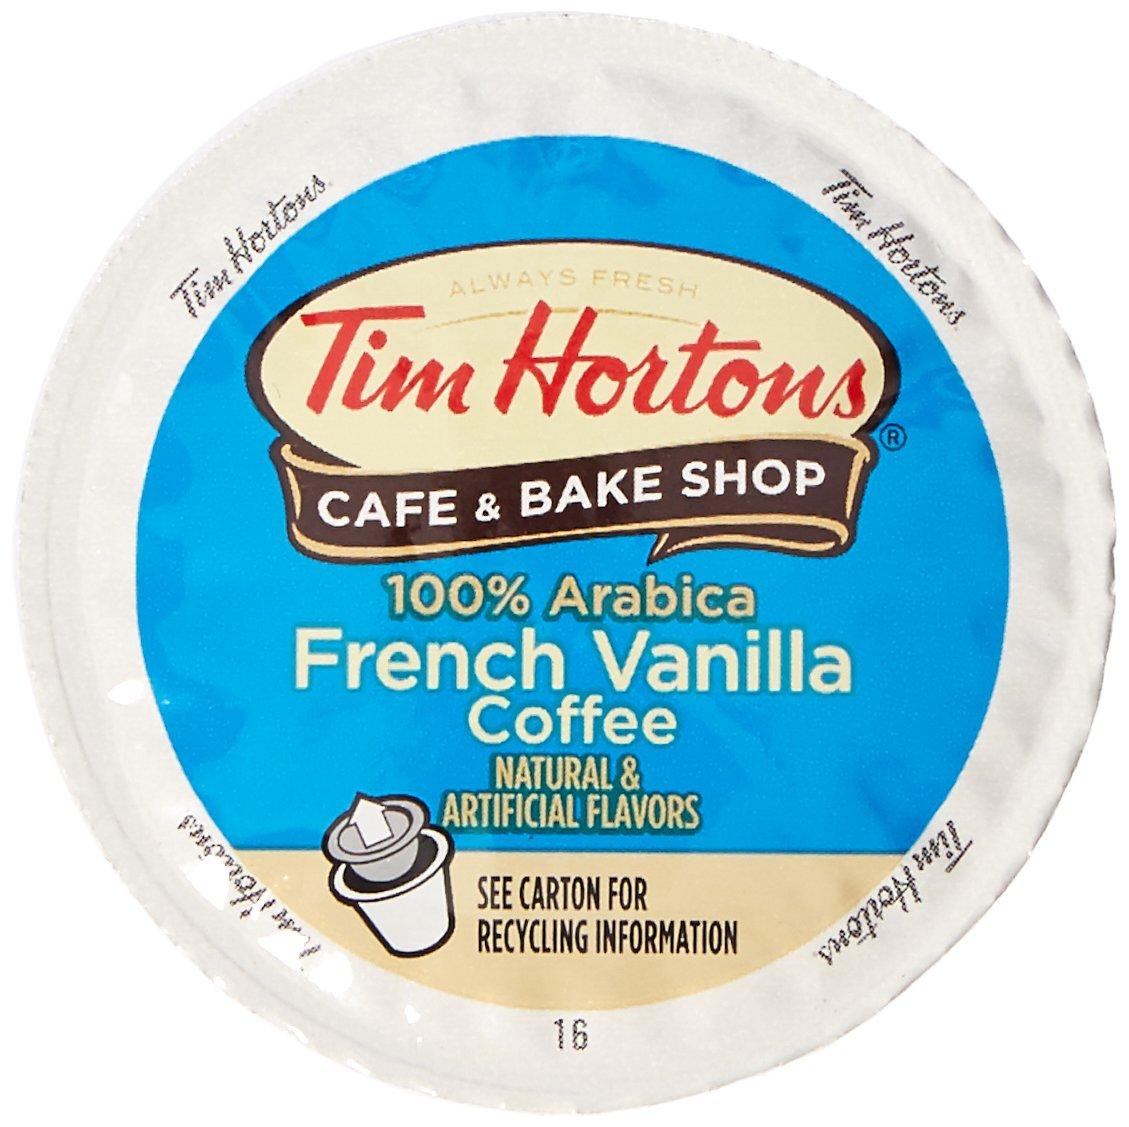 Tim Hortons French Vanilla, 48 Count